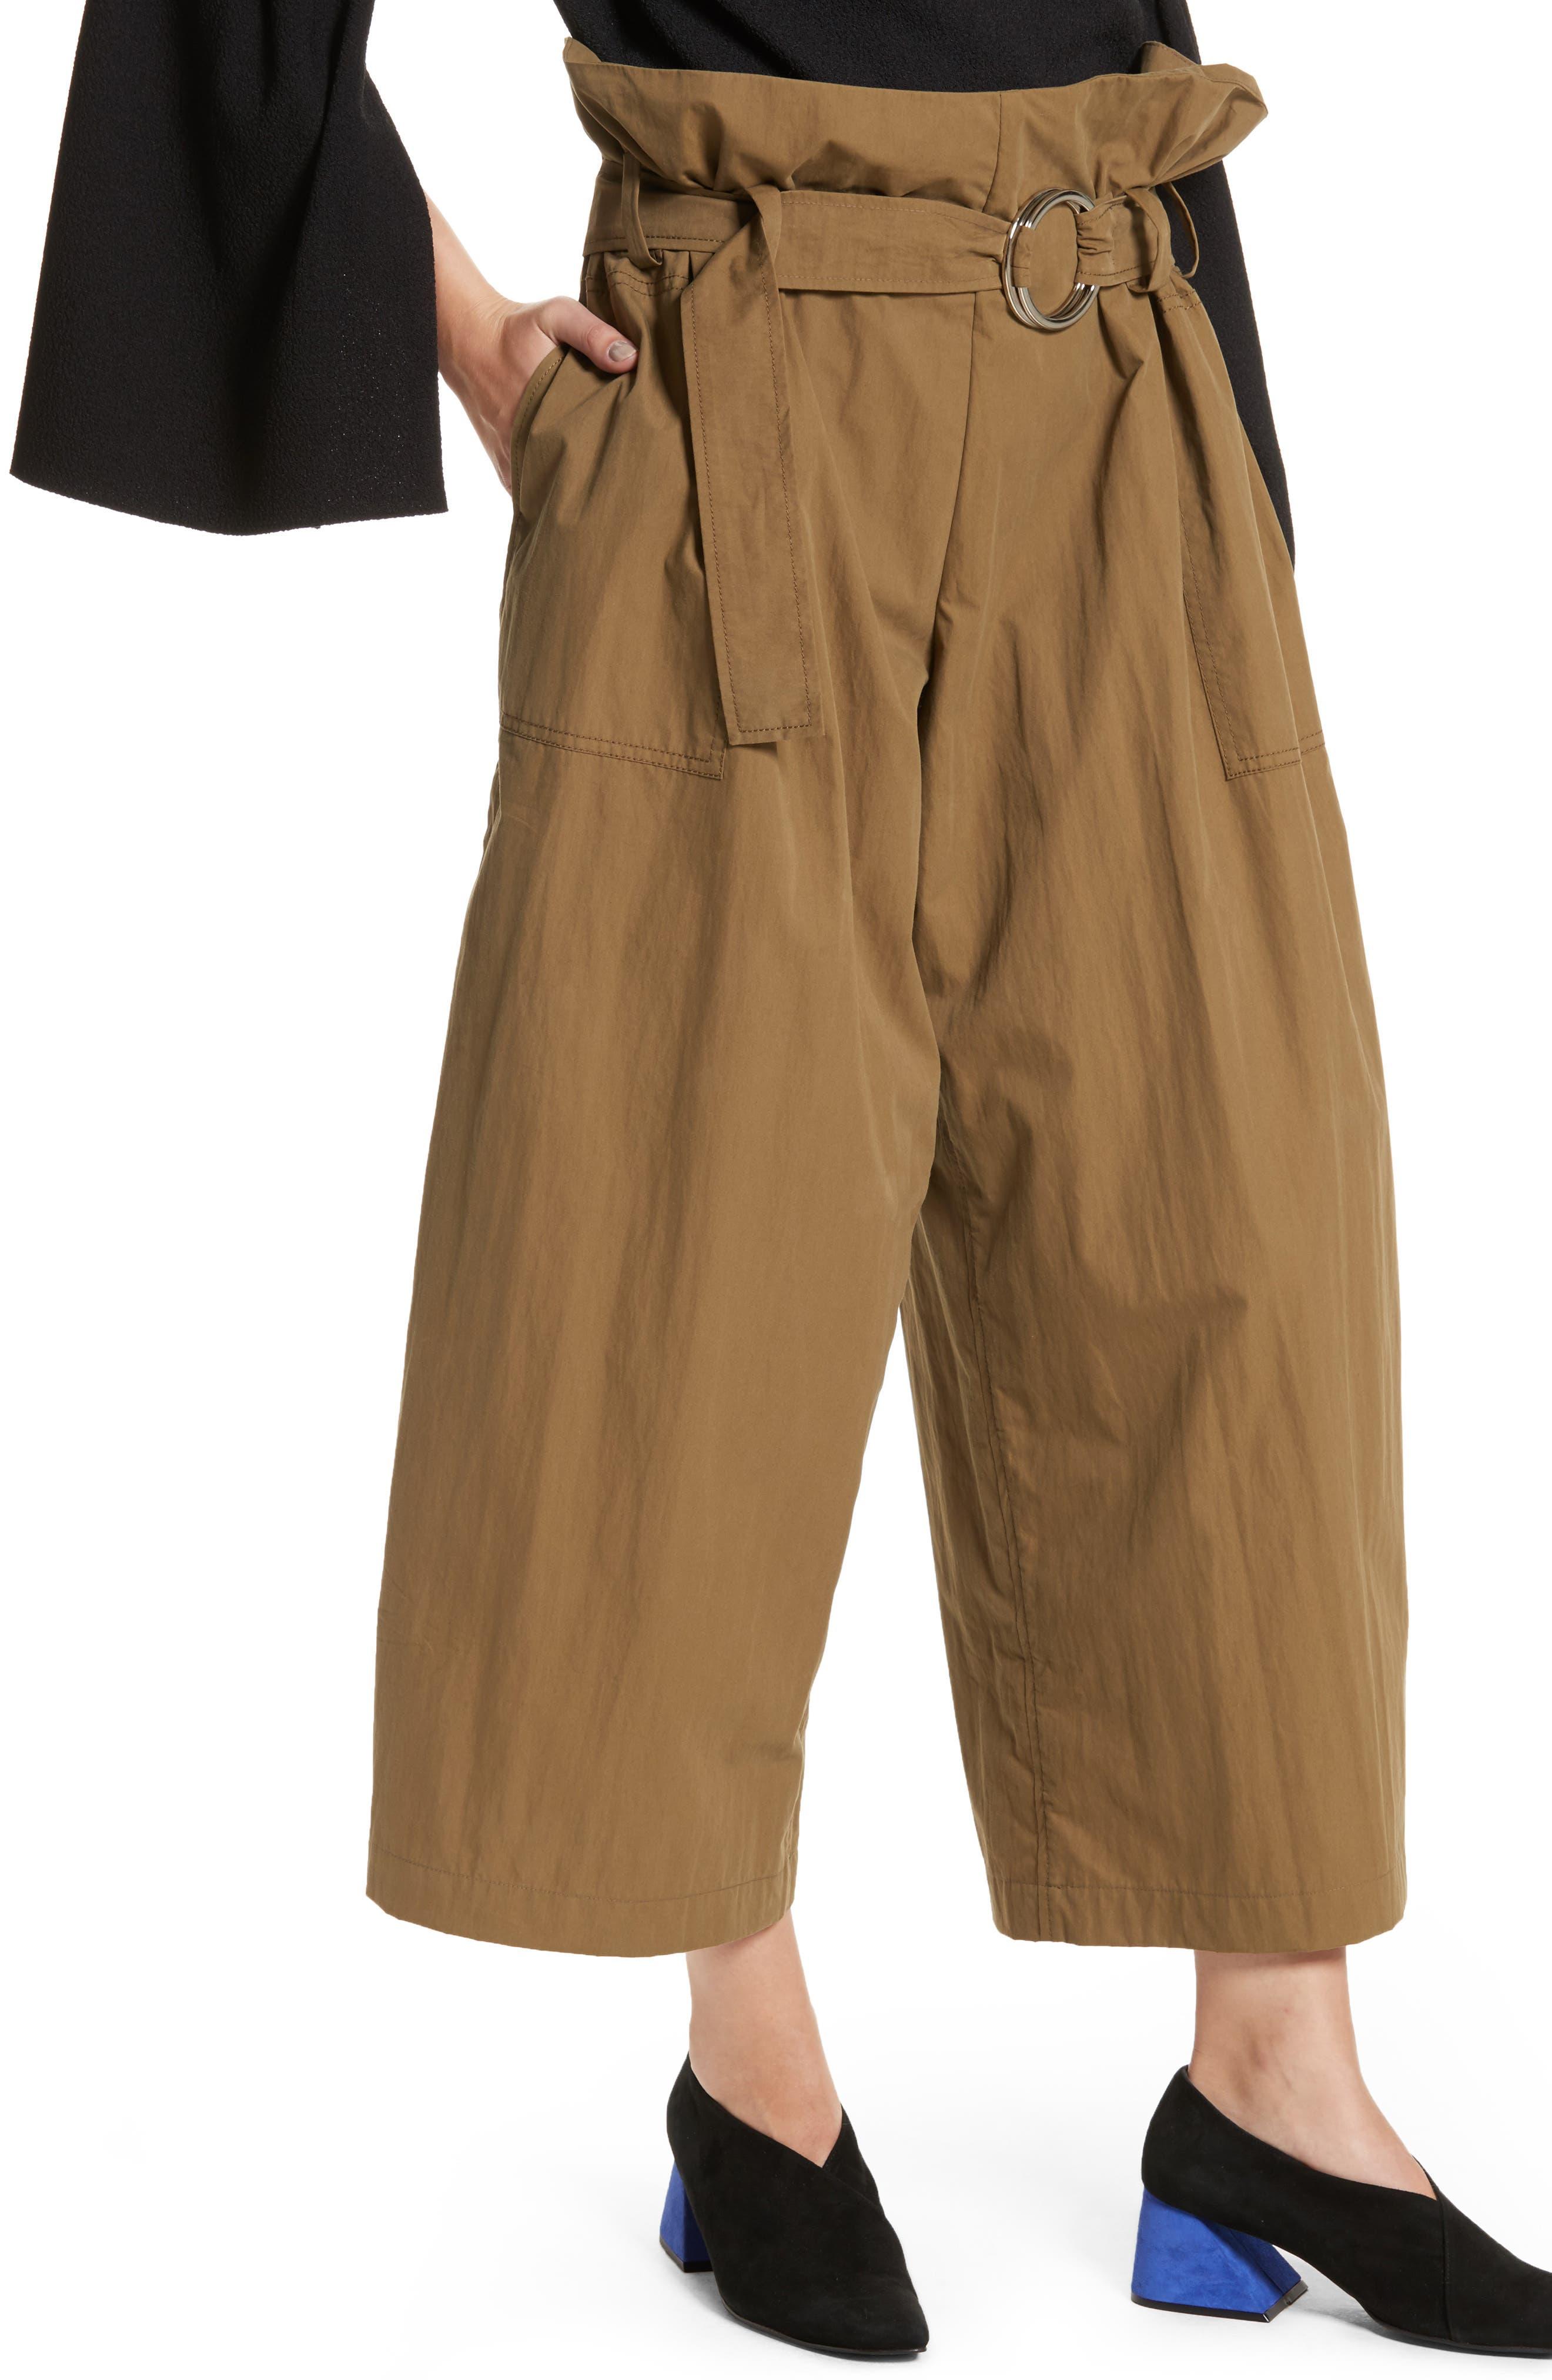 Tilly Belted Paperbag Pants,                             Alternate thumbnail 4, color,                             310